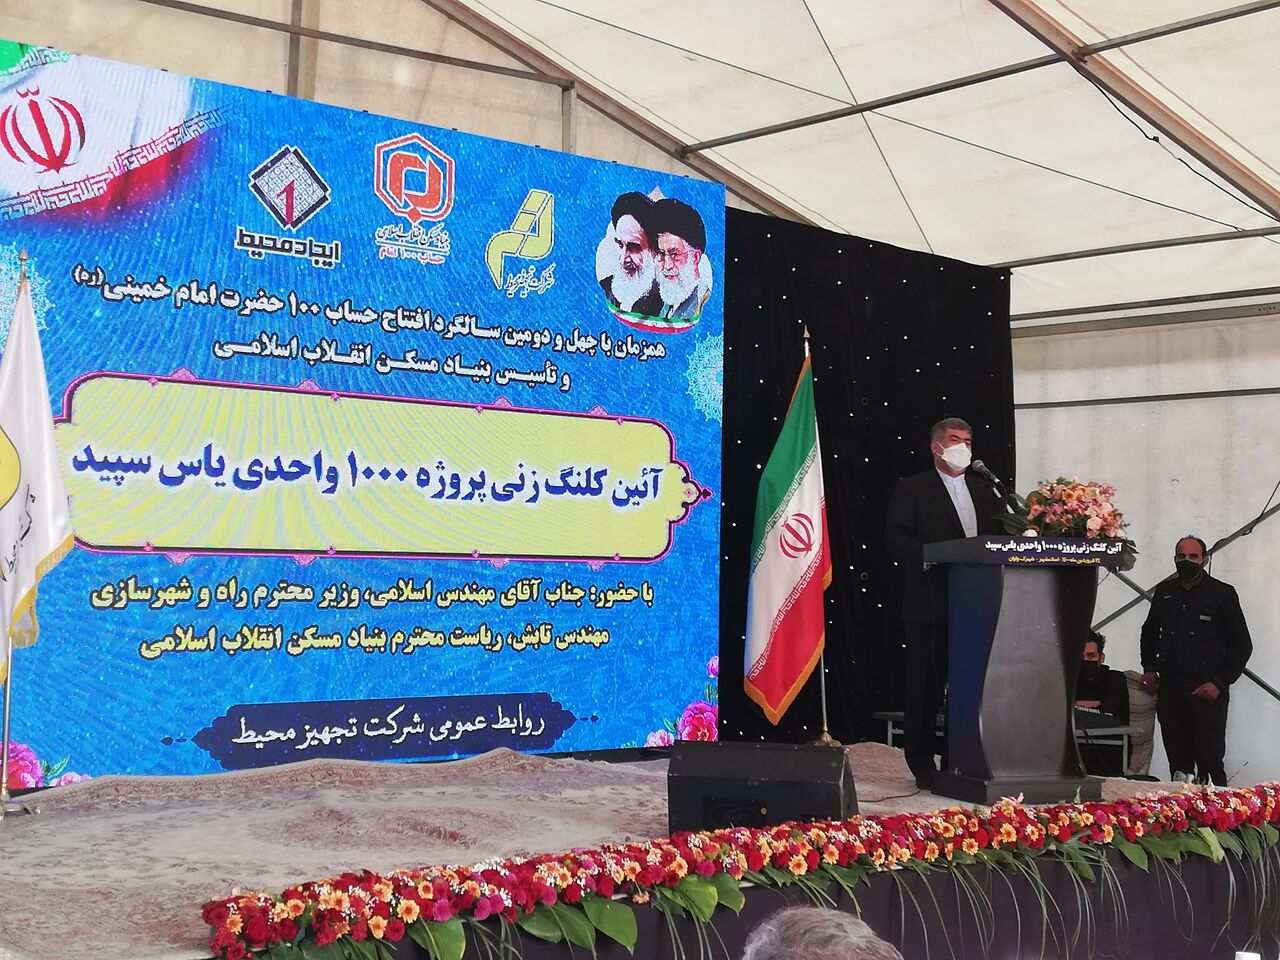 پروژه عظیم مترو اسلامشهر توجه ویژه دولت را میطلبد